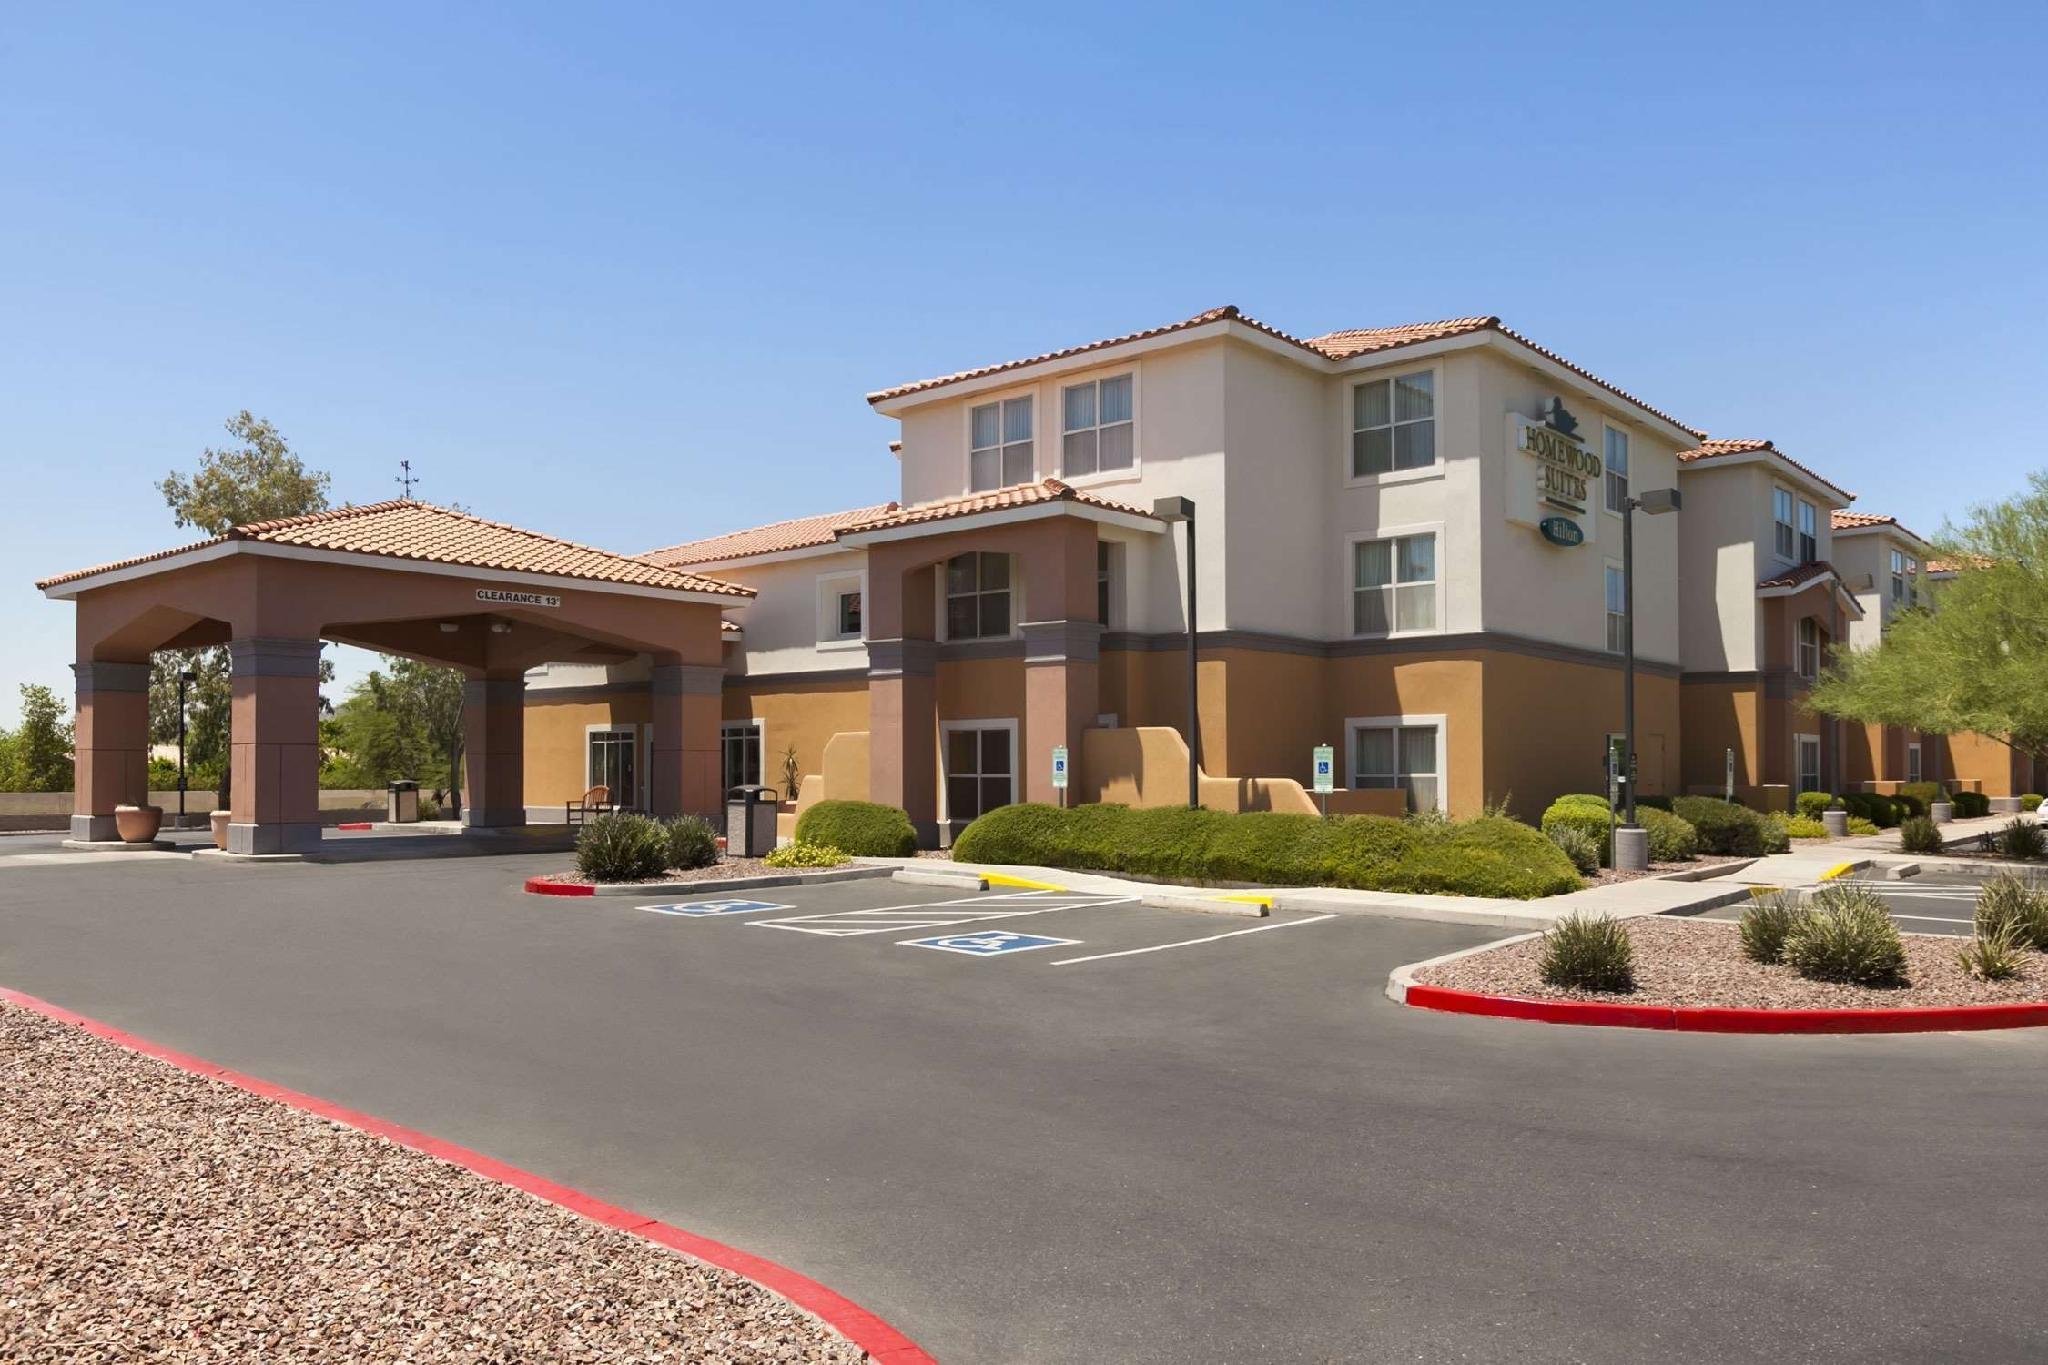 Homewood Suites Phoenix Scottsdale Hotel